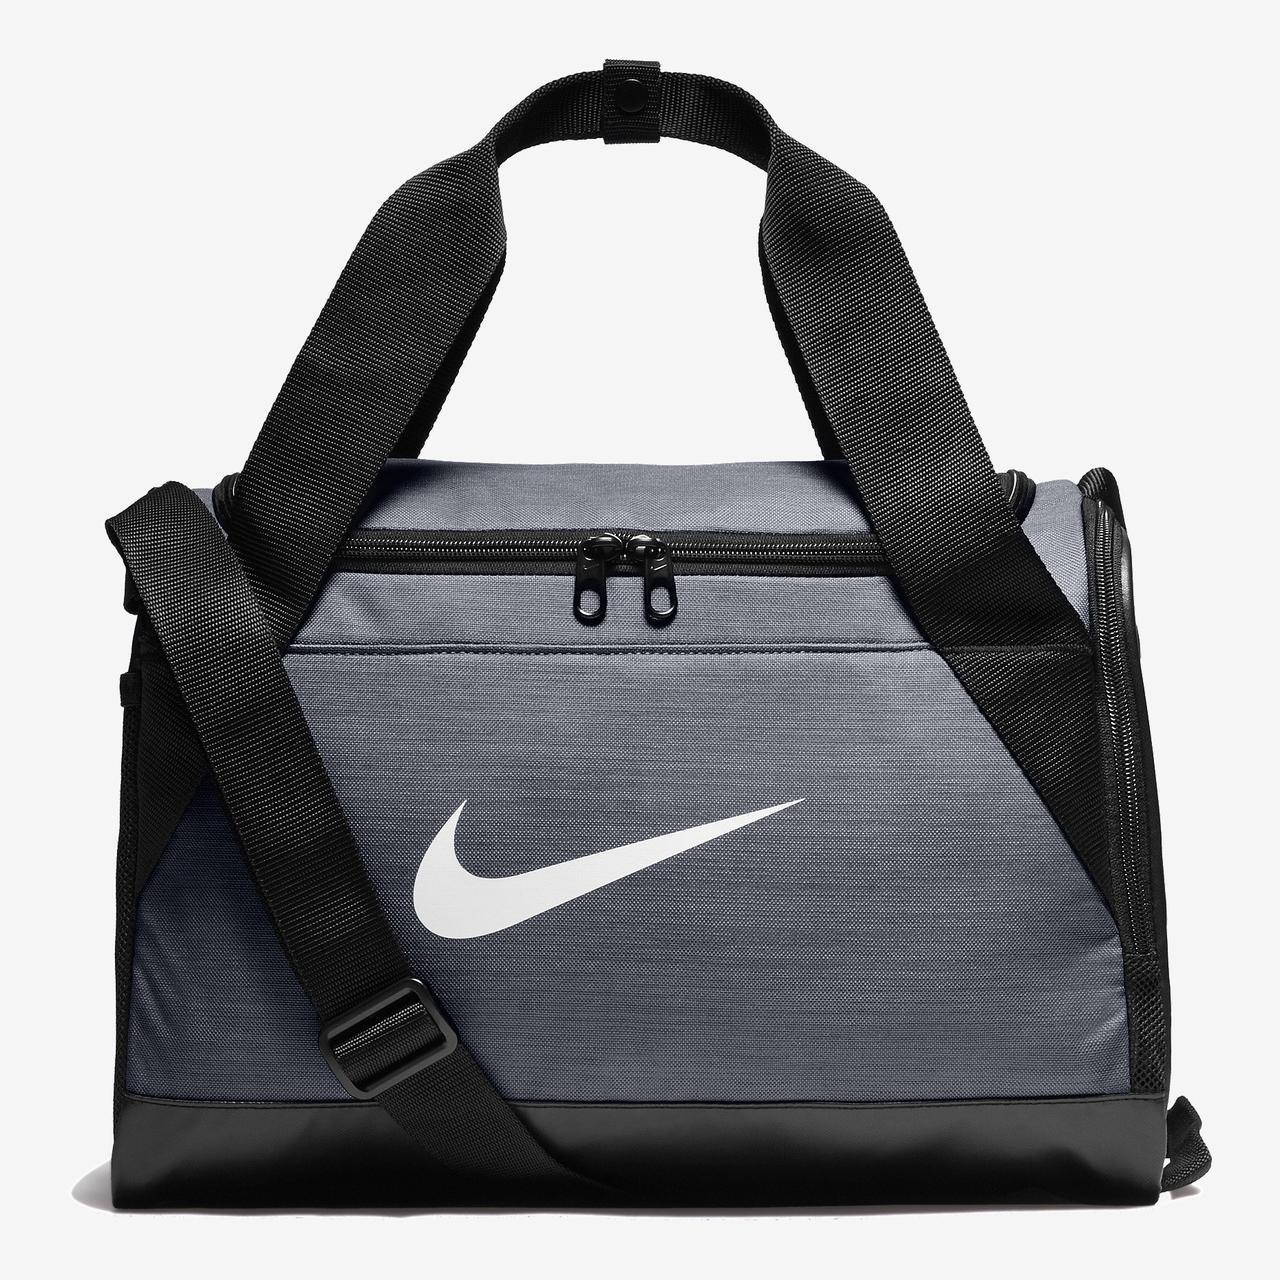 de8fe217f8a4 Спортивная сумка Nike Brazilia Duffel BA5335-064 S 40 л (original)  маленькая мужская женская